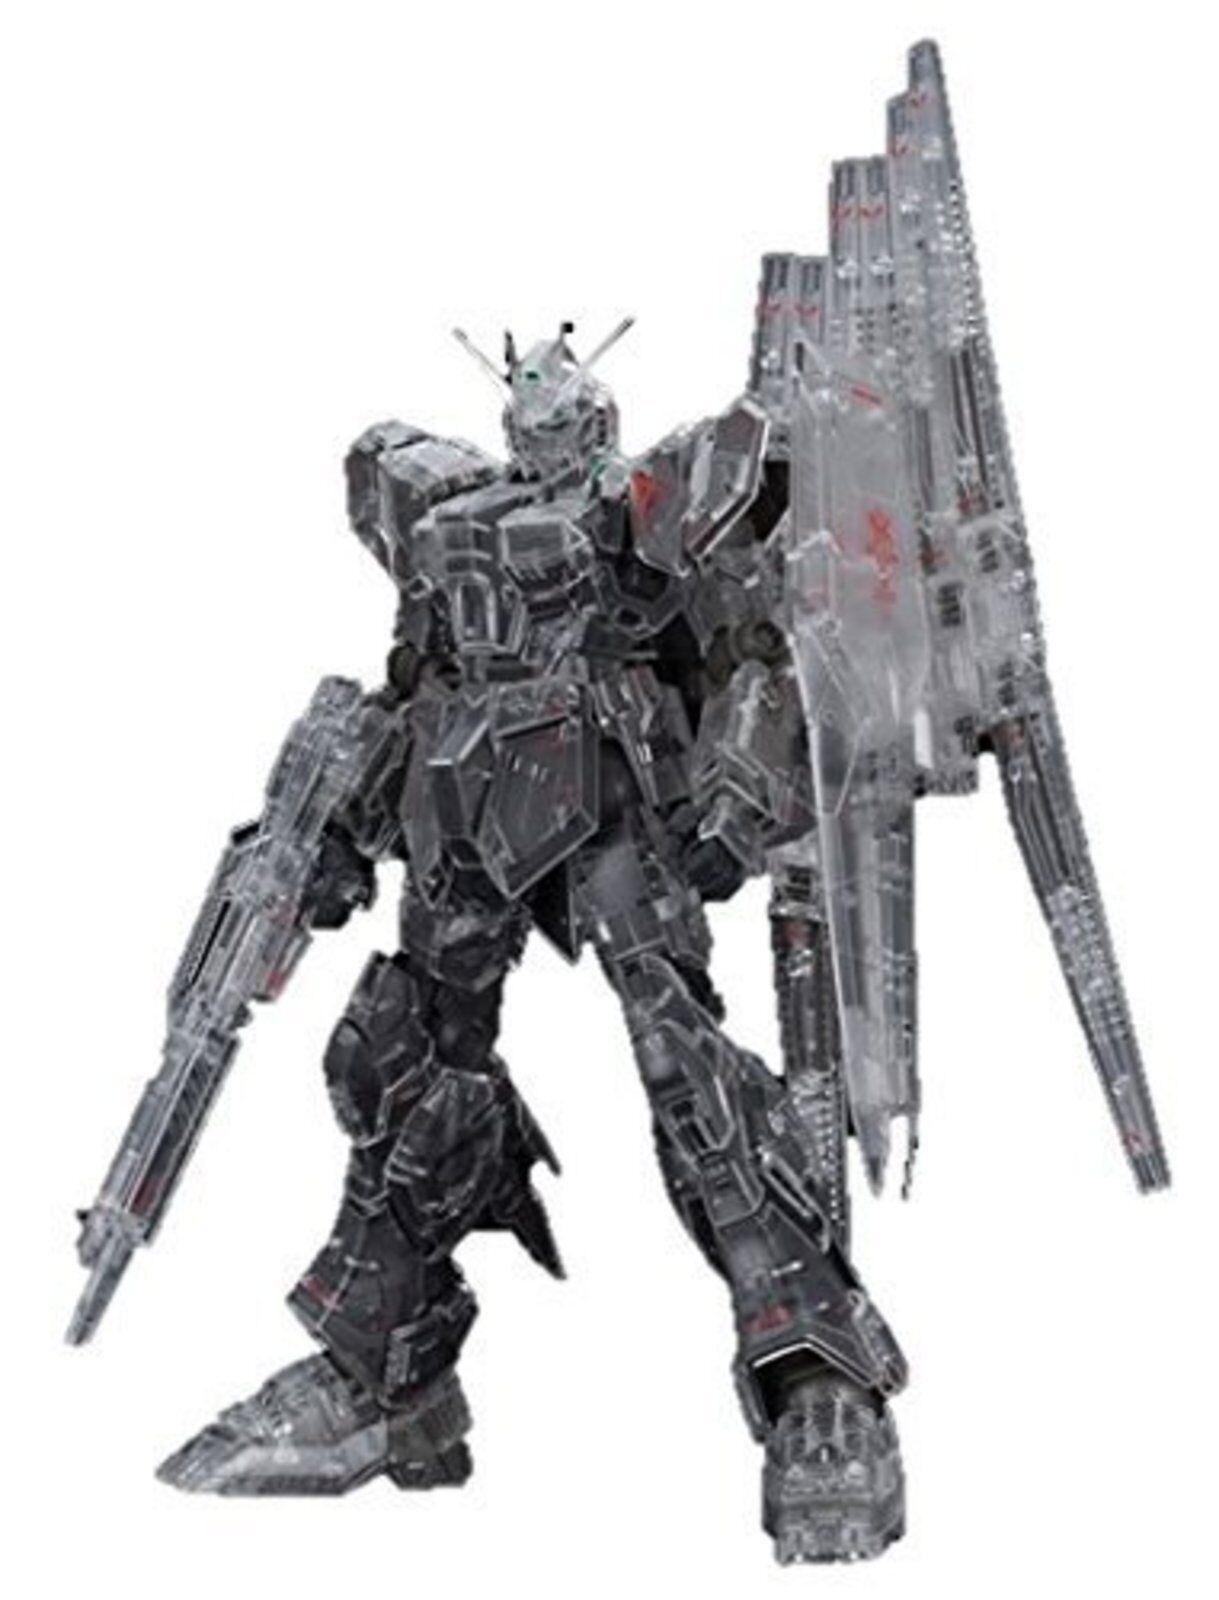 MG V Gundam Ver. Ka Meccanici Meccanici Meccanici Trasparente Gunpla Expo Limitata 1 100 F S W  515da8